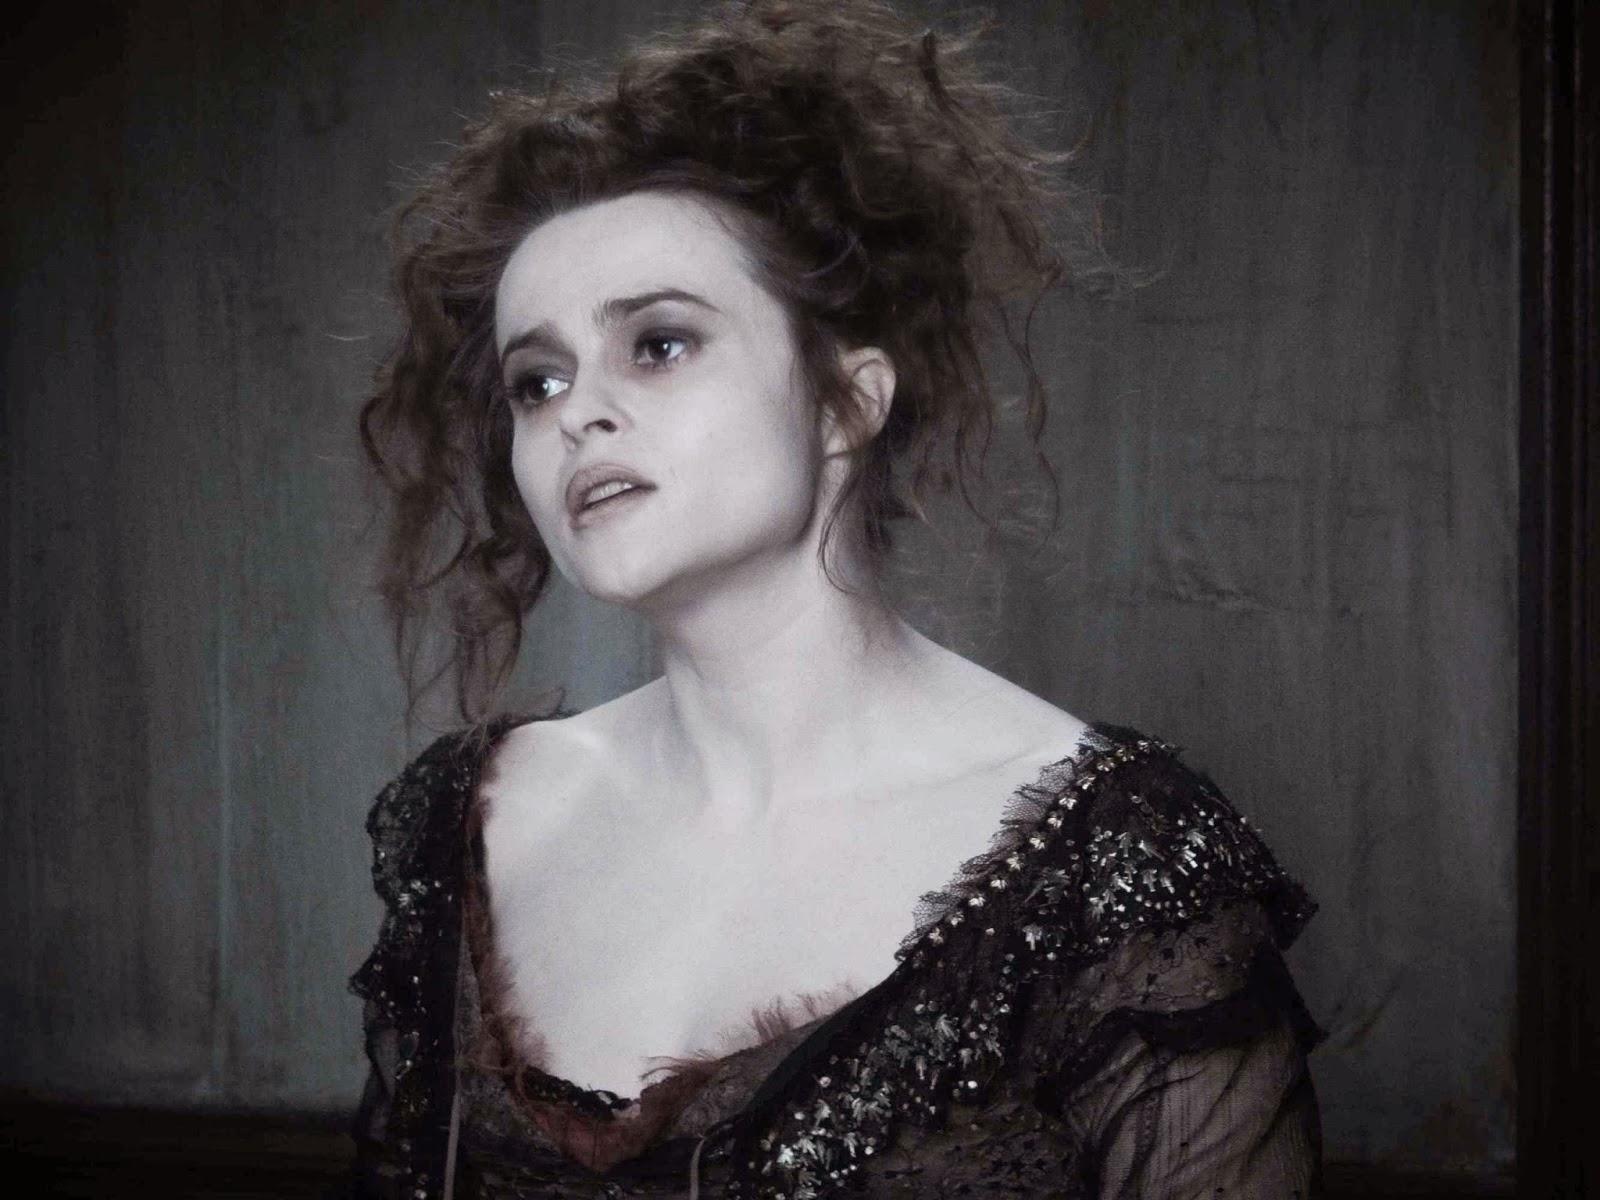 FormidableArtistry: Sweeney Todd | Mrs. Lovett Makeup